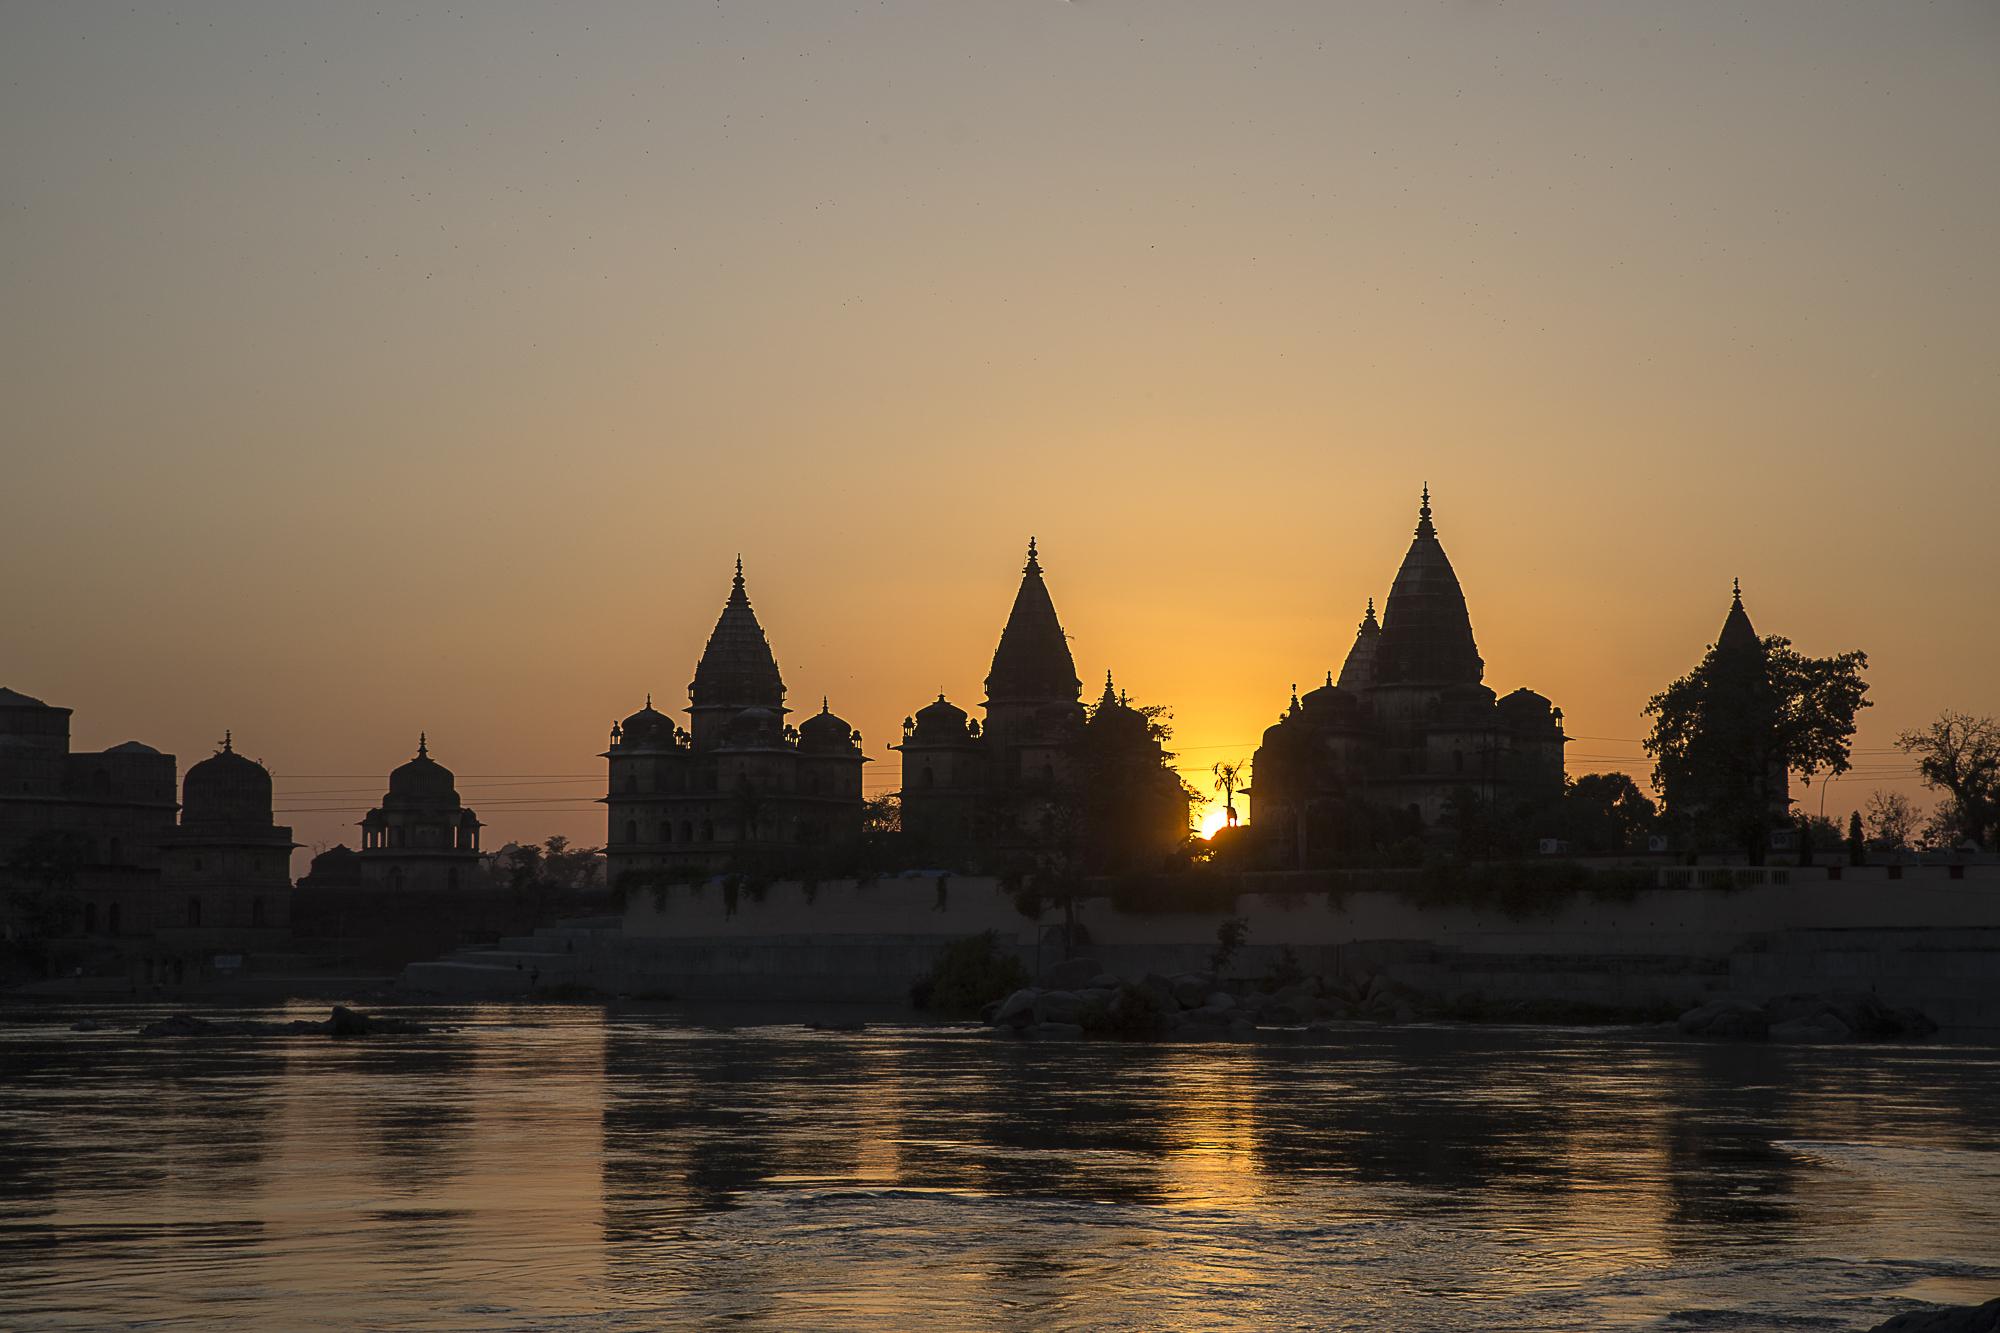 Oraccha, India - fortress at sunset, 3 Days*, Barbara Huber